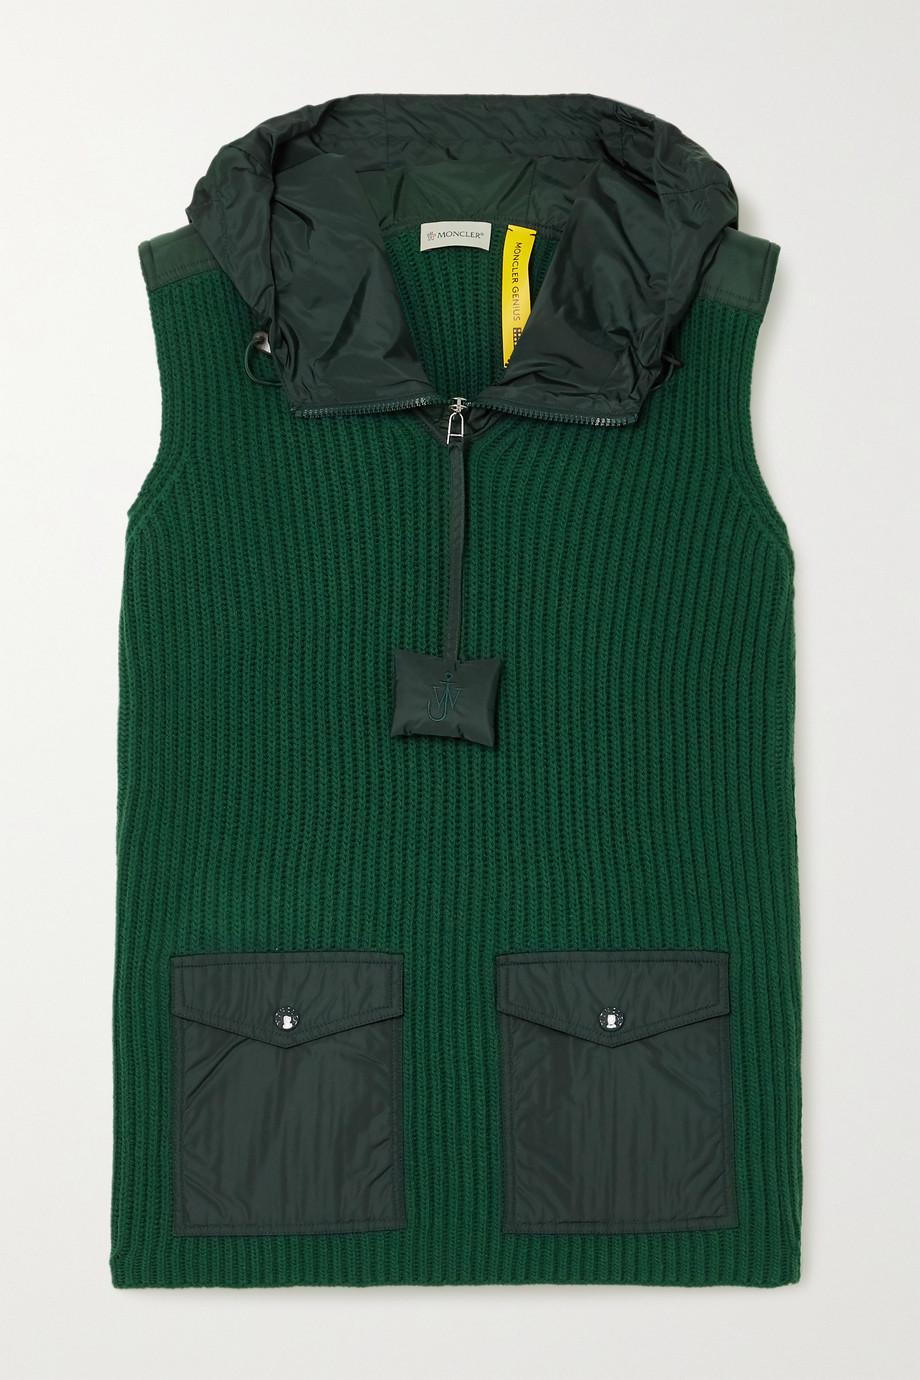 Moncler Genius x 1 JW Anderson 软壳面料边饰罗纹羊毛连帽背心